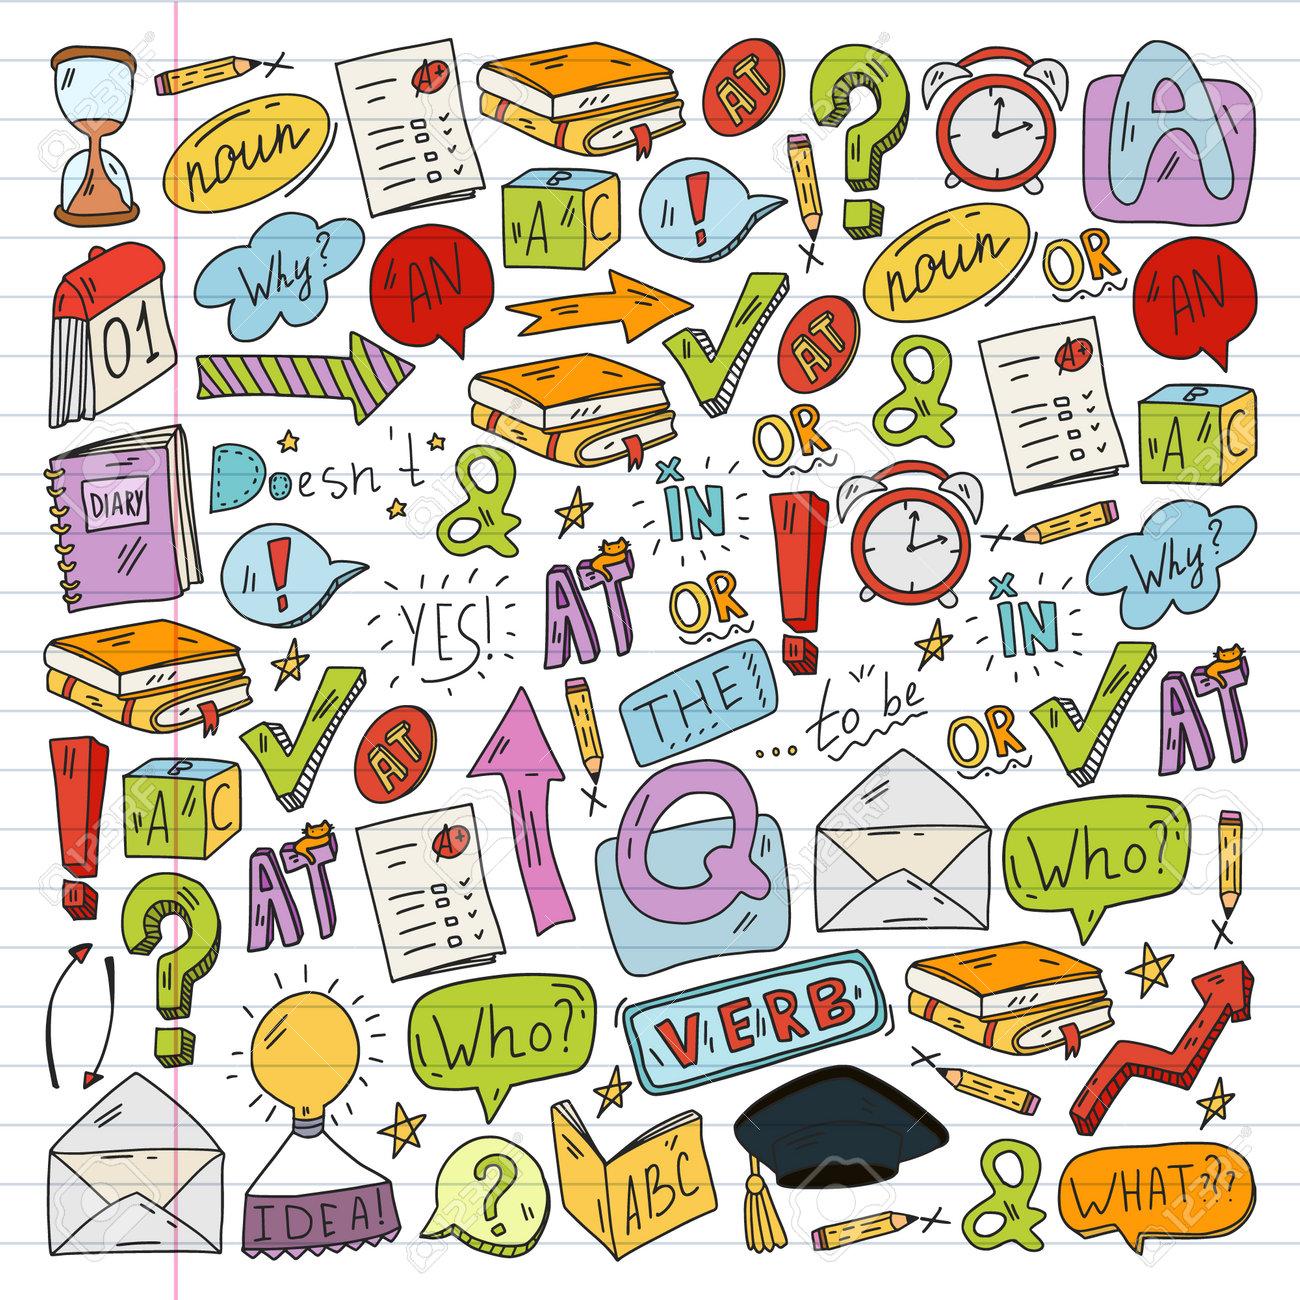 Doodle vector concept illustration of learning English language. English language courses. School. College. University. - 173370492